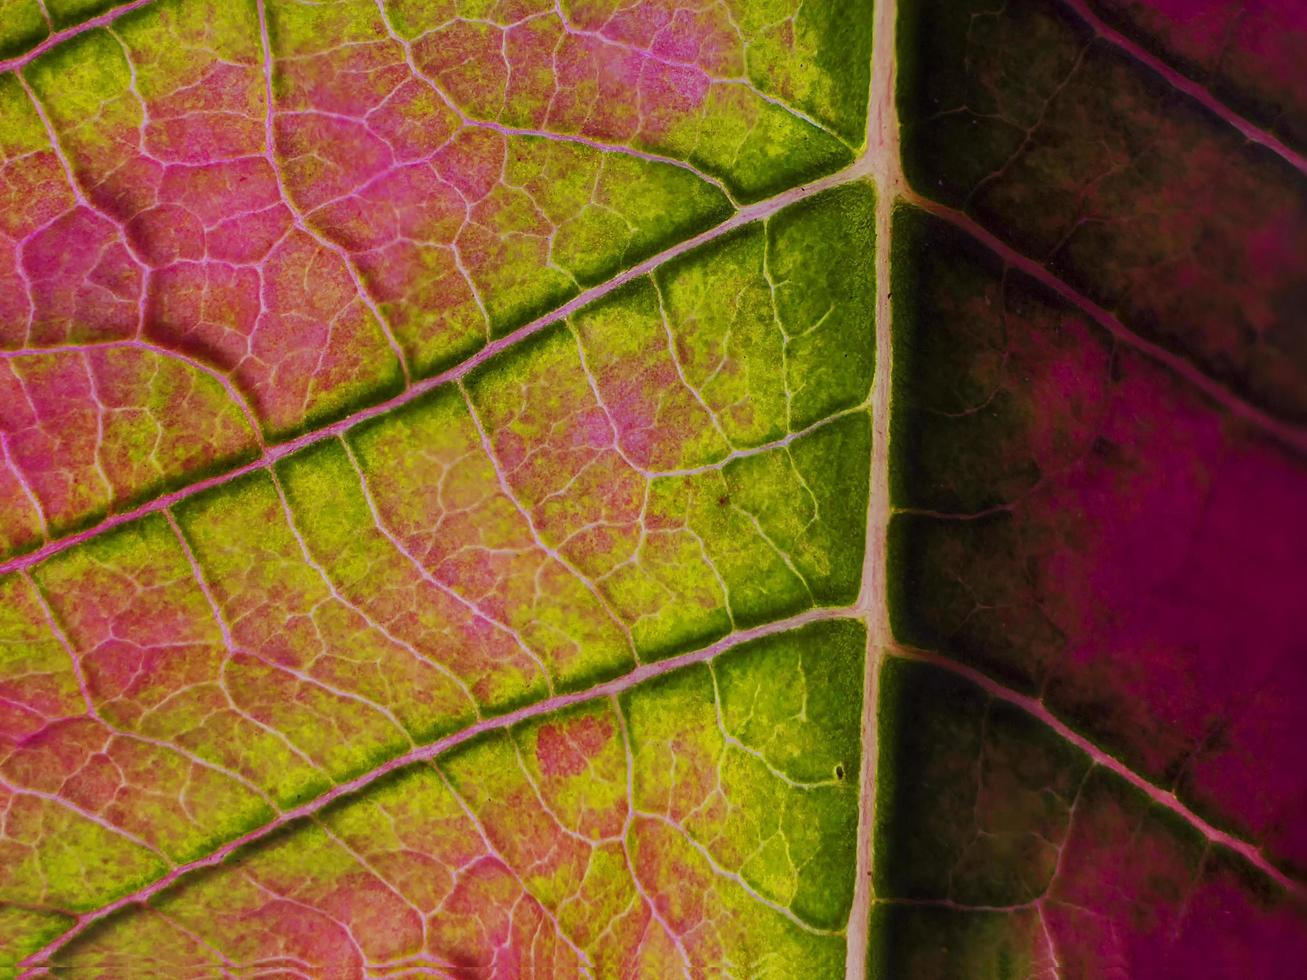 poinsettia blad close-up foto